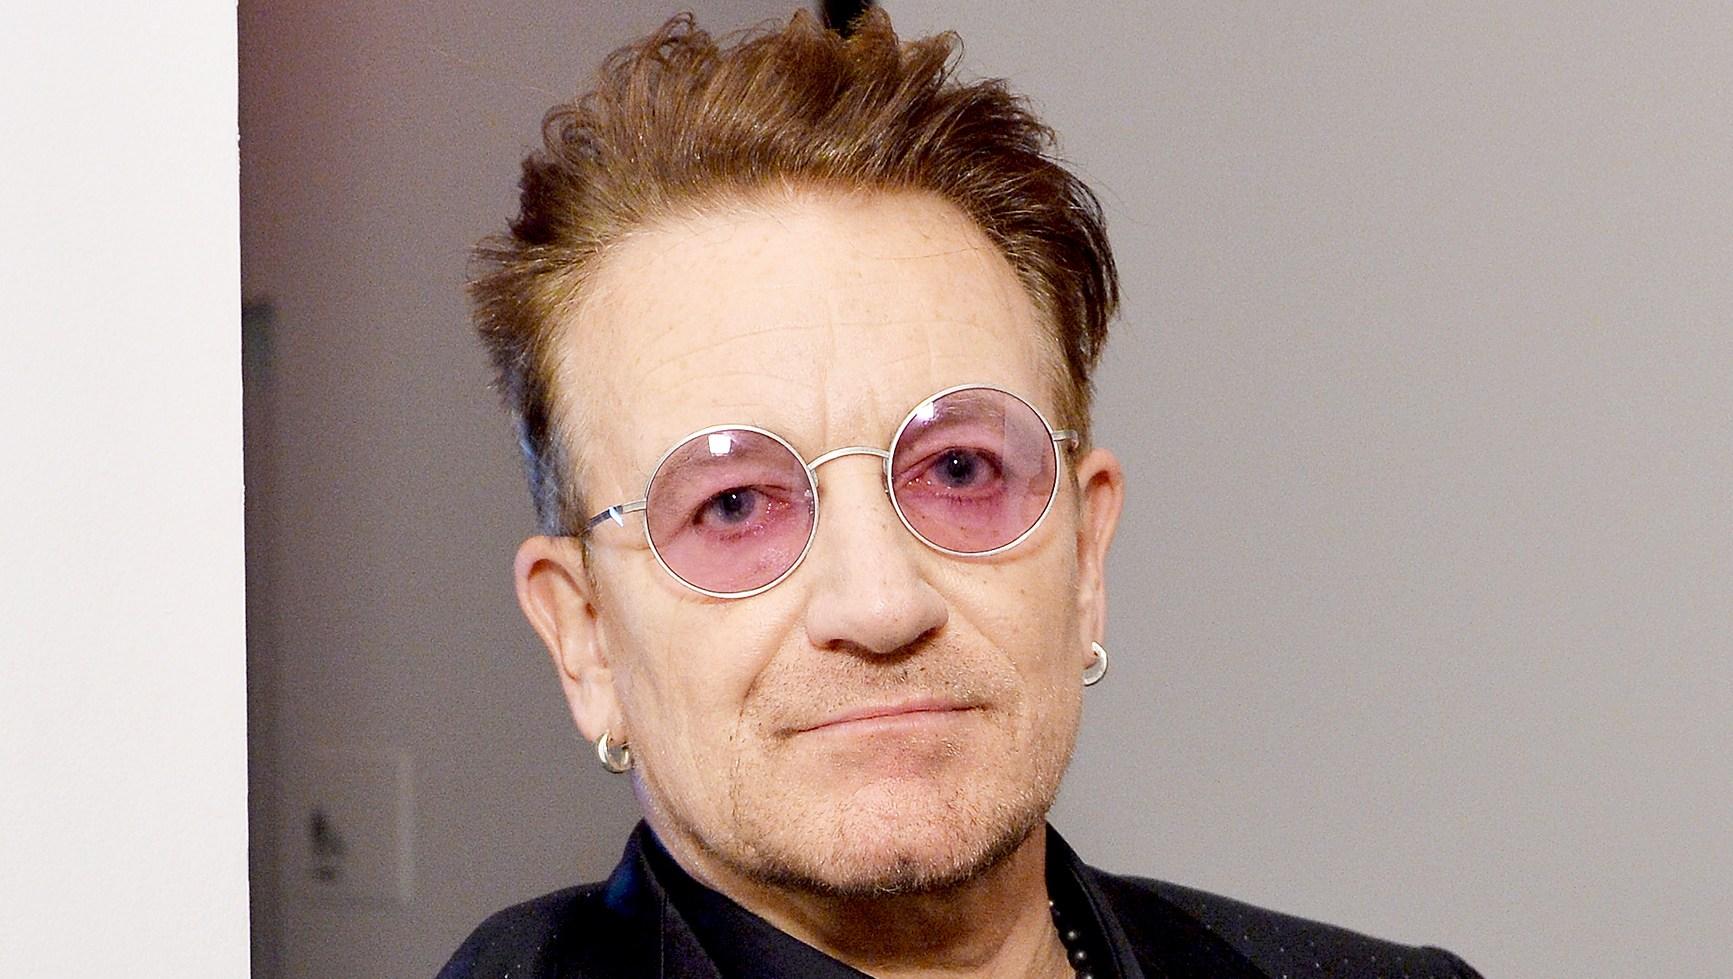 Bono-music-too-girly